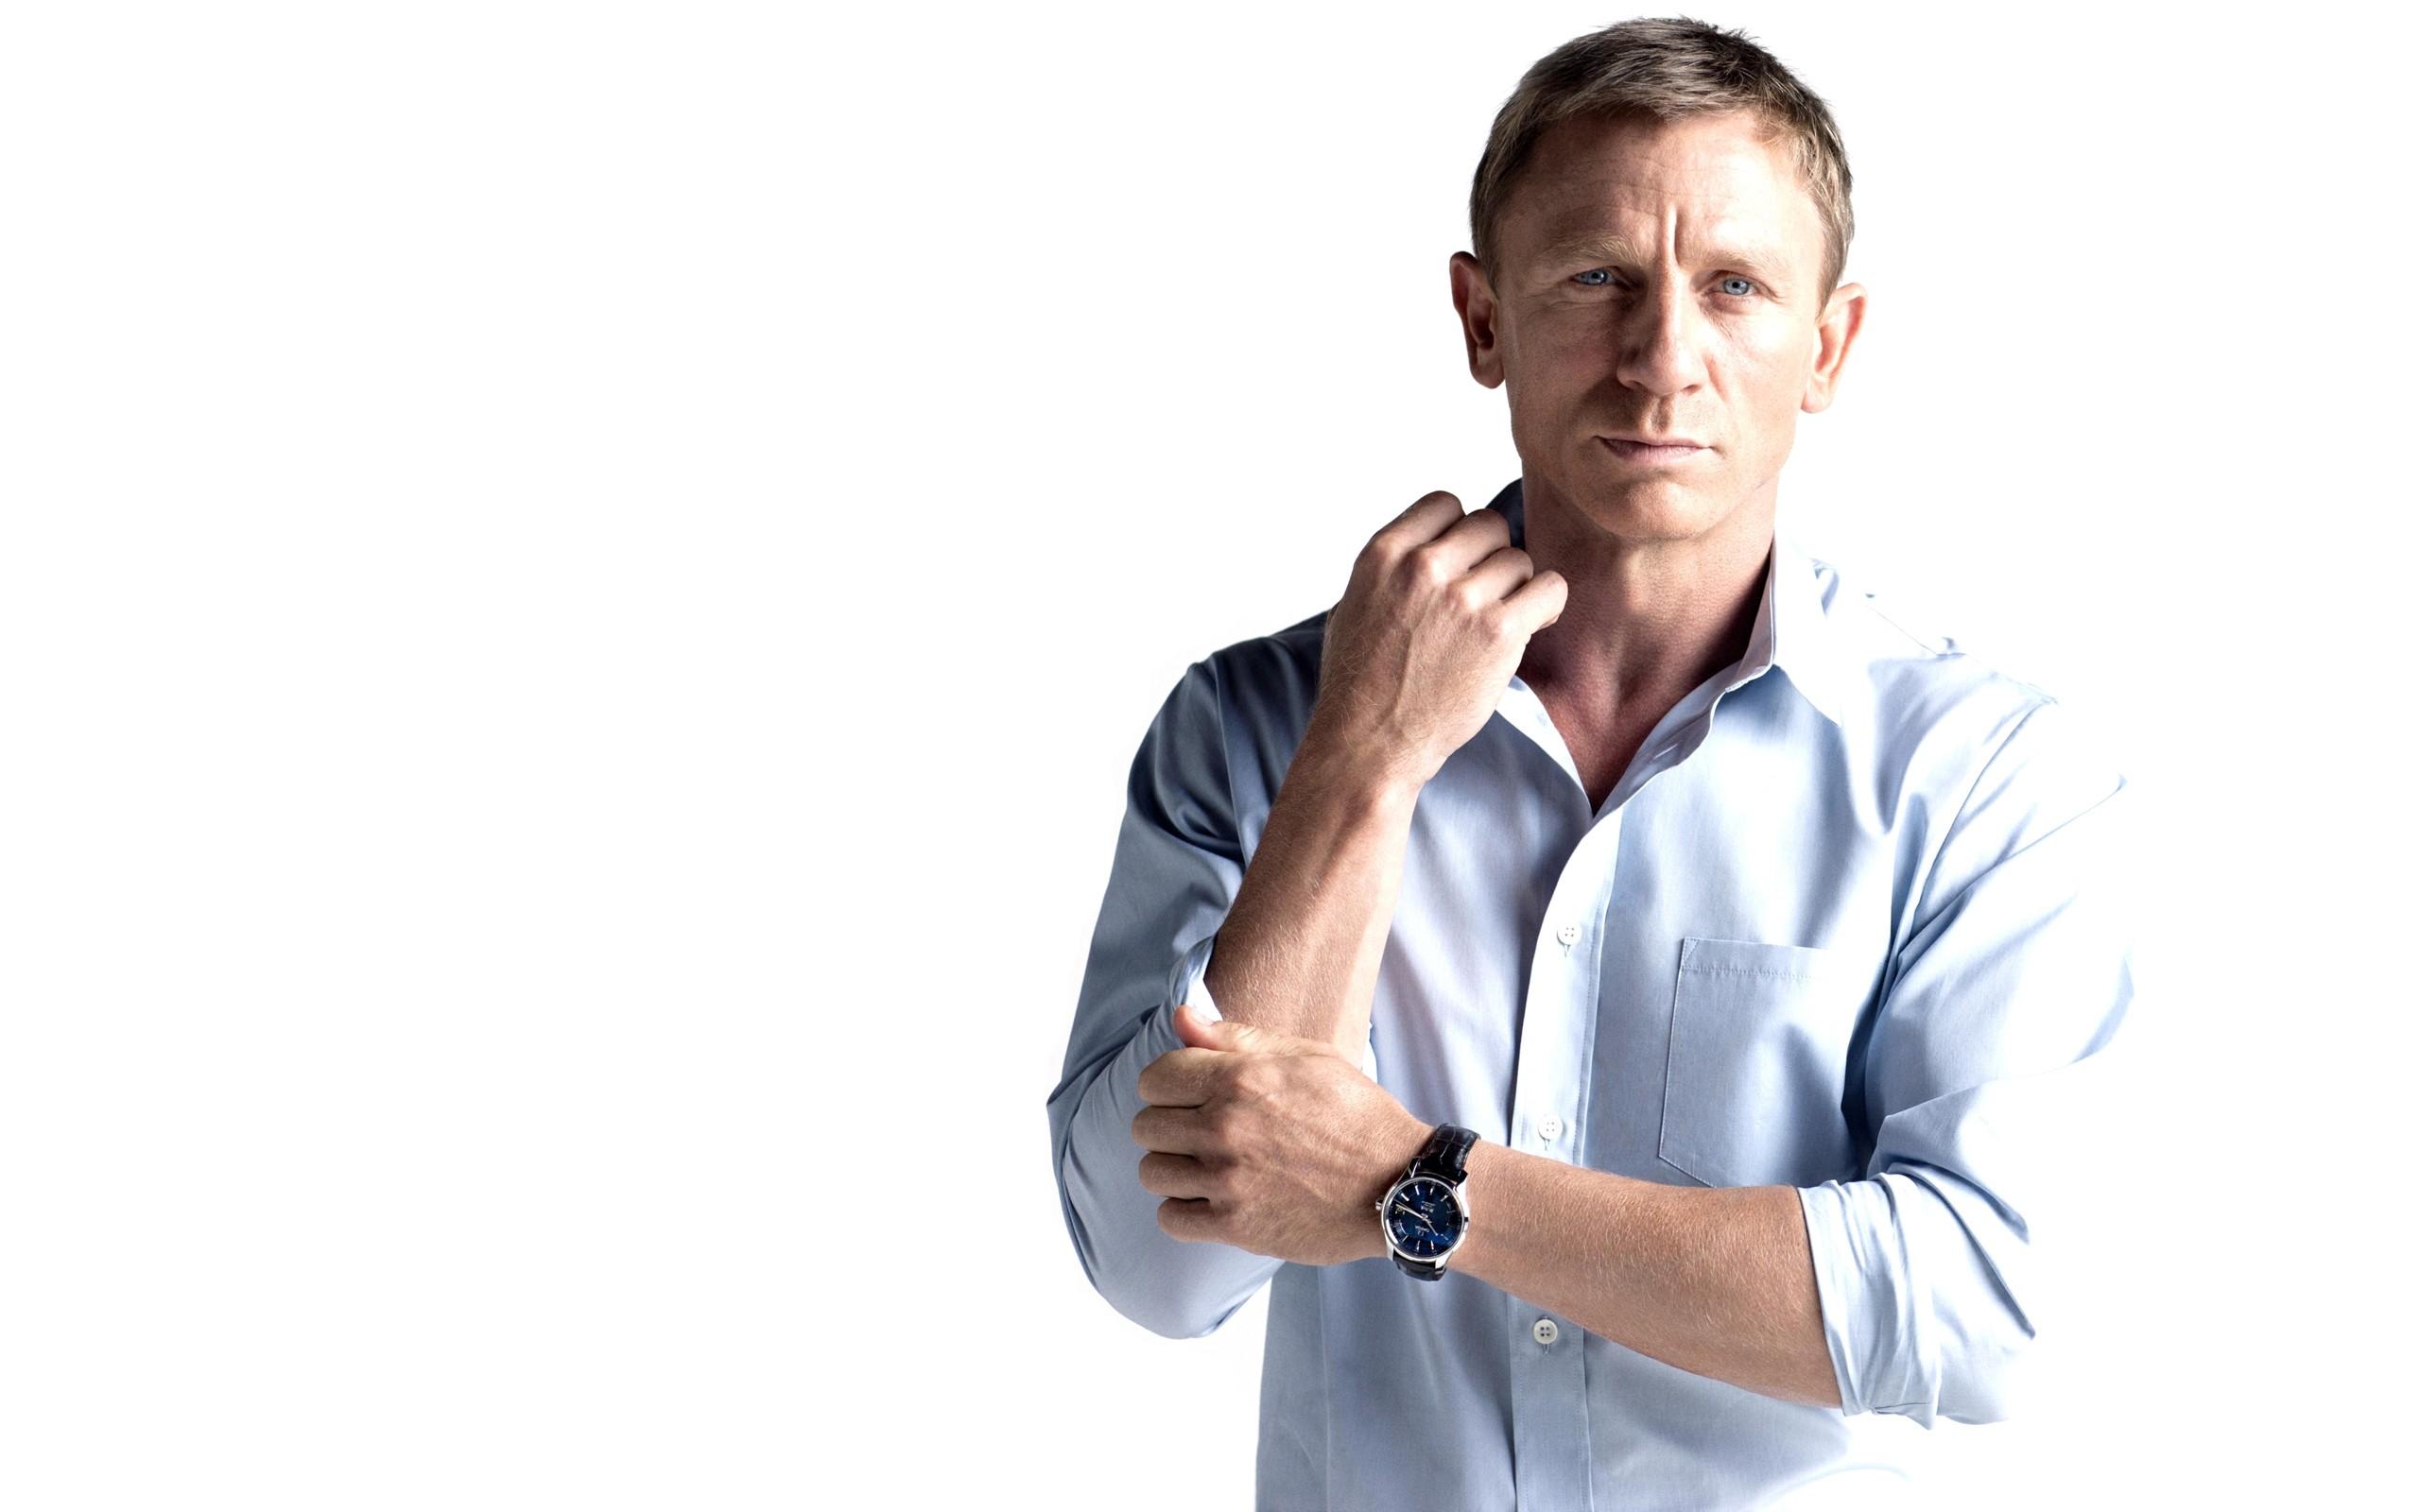 Download Wallpaper men james bond people actors daniel craig watches white background -3782-37